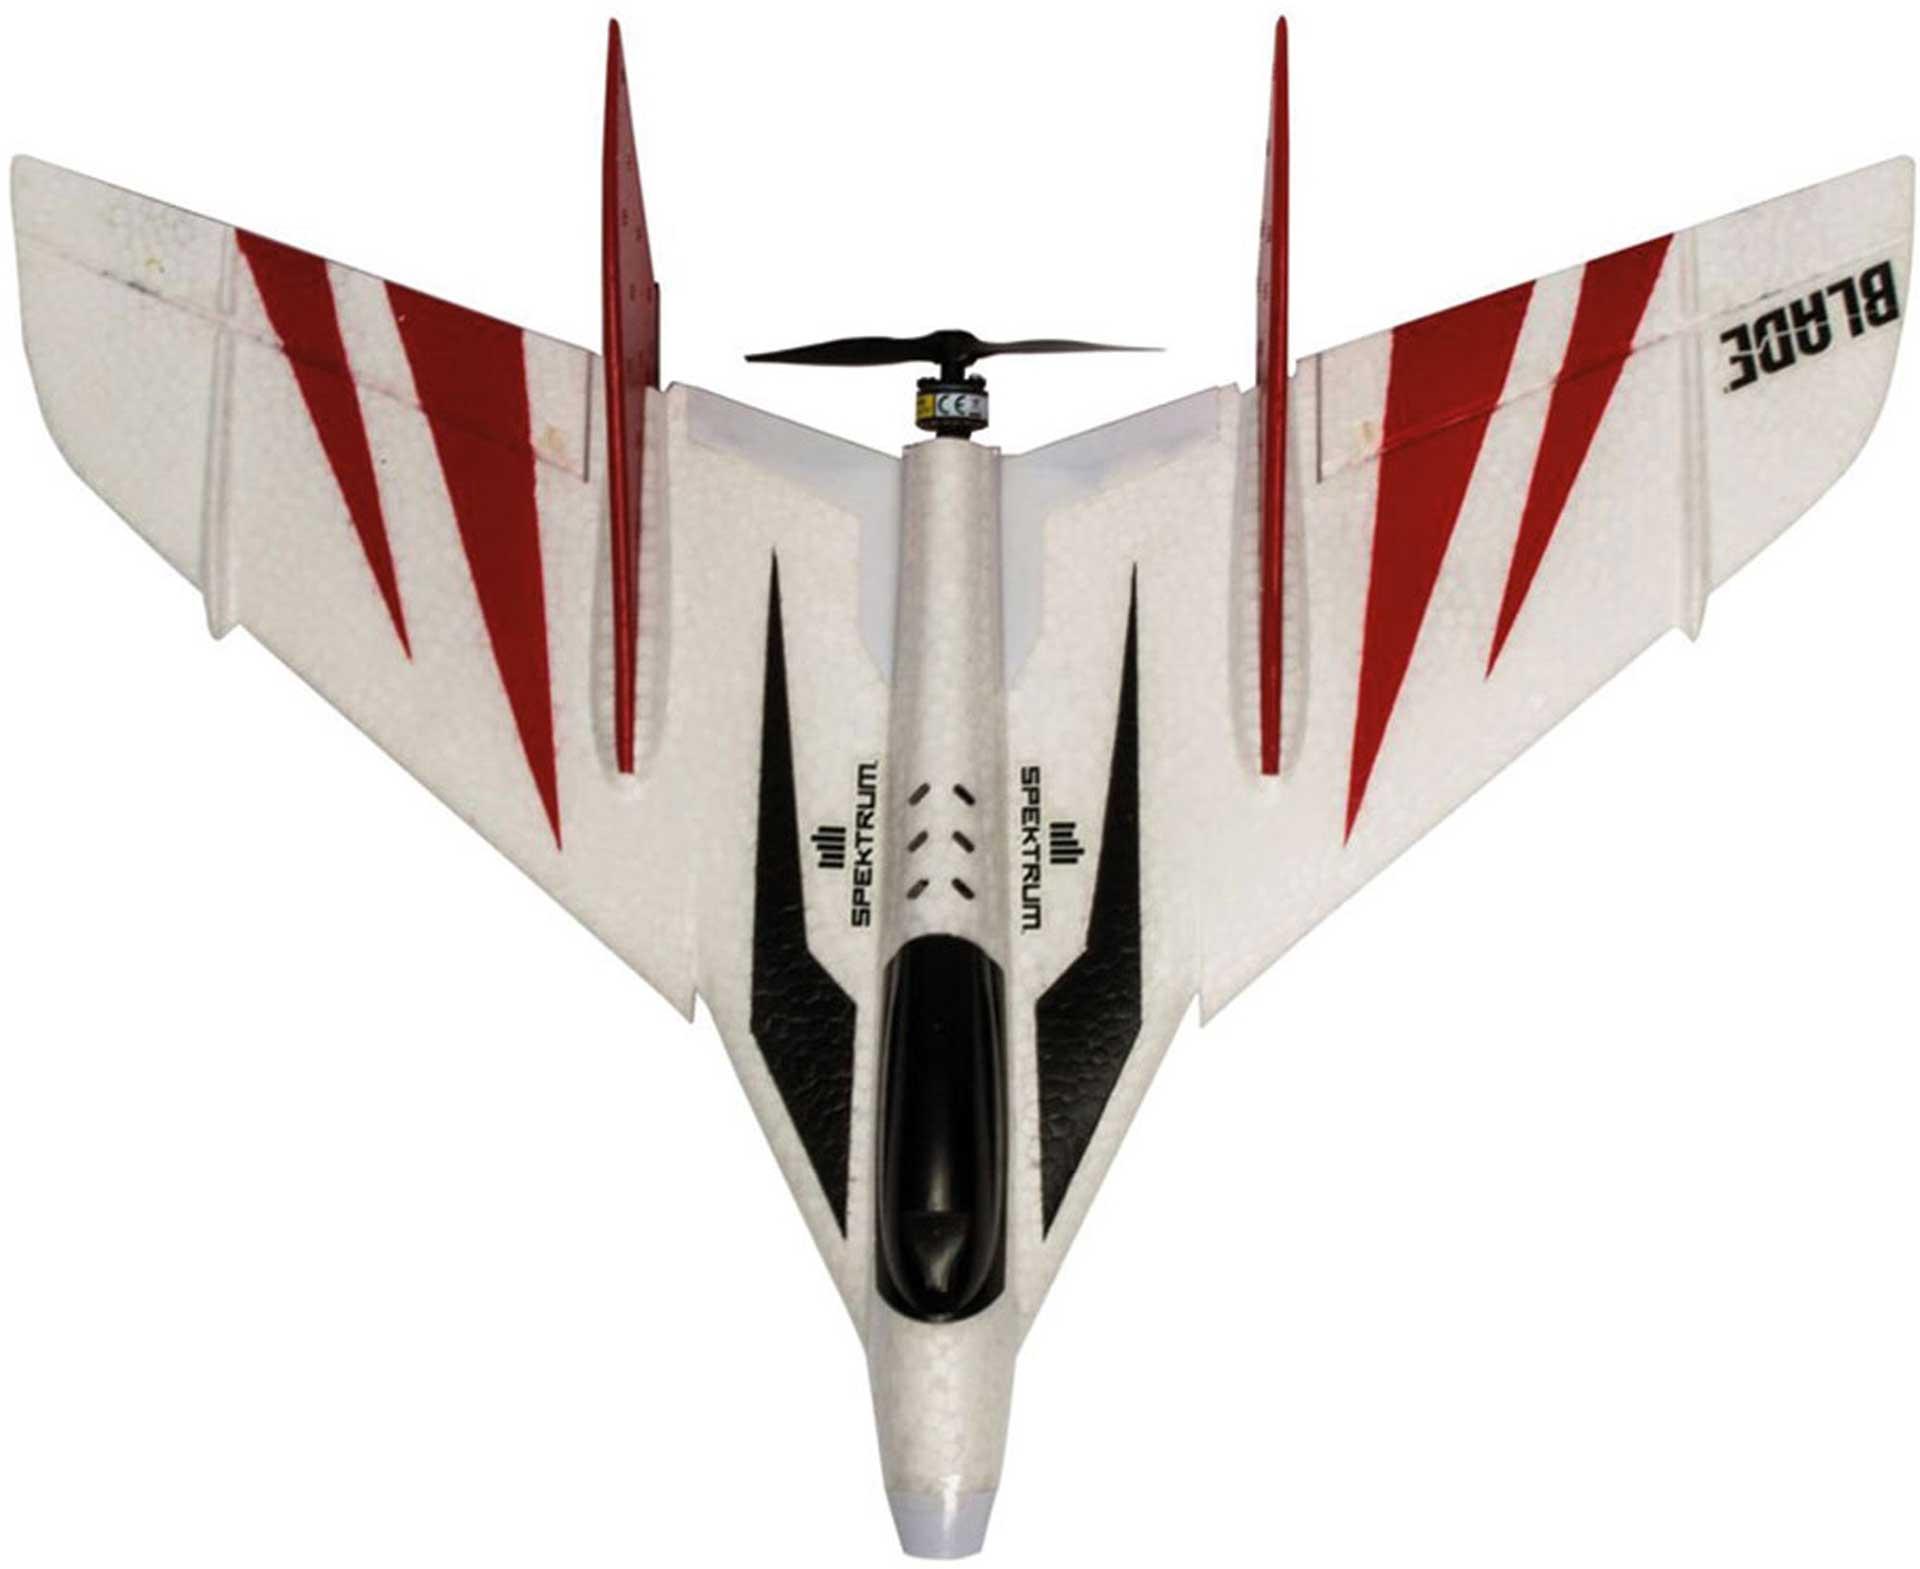 BLADE UMX F-27 STRYKER FPV 432MM BNF BASIC